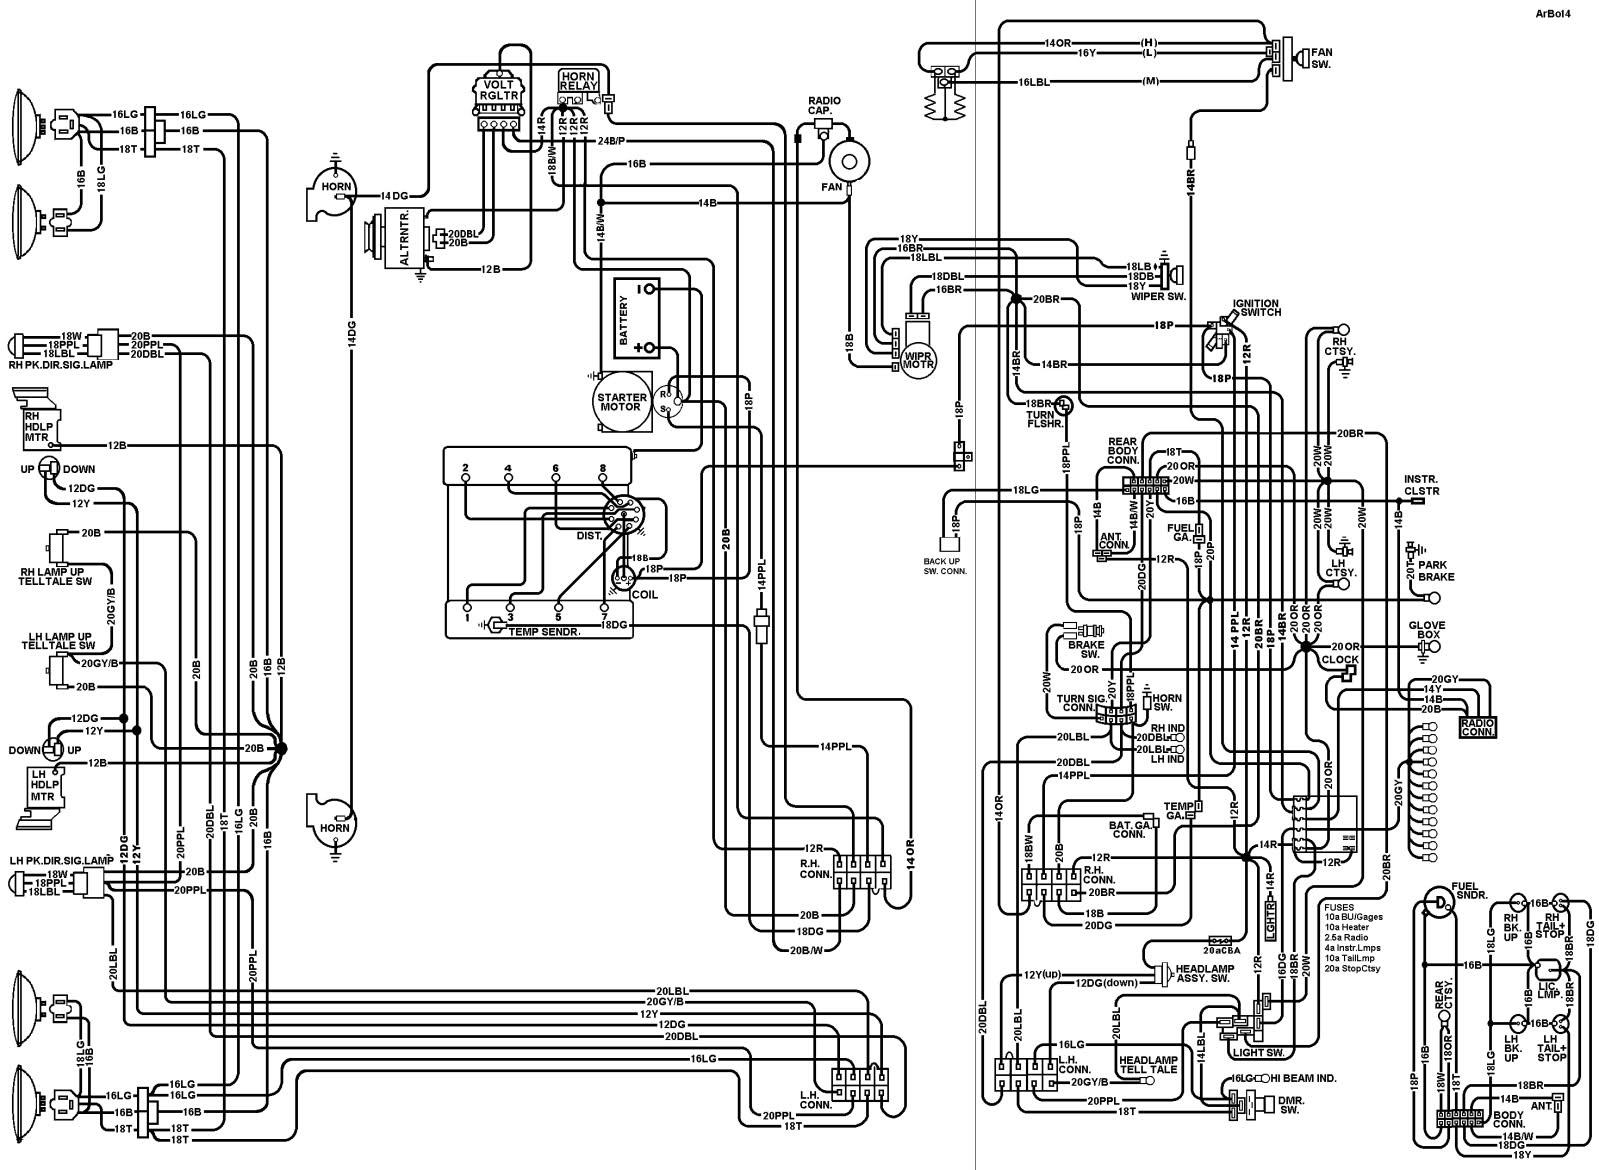 1969 Corvette Headlight Switch Wiring Diagram - All Wiring Diagram Data - Headlight Switch Wiring Diagram